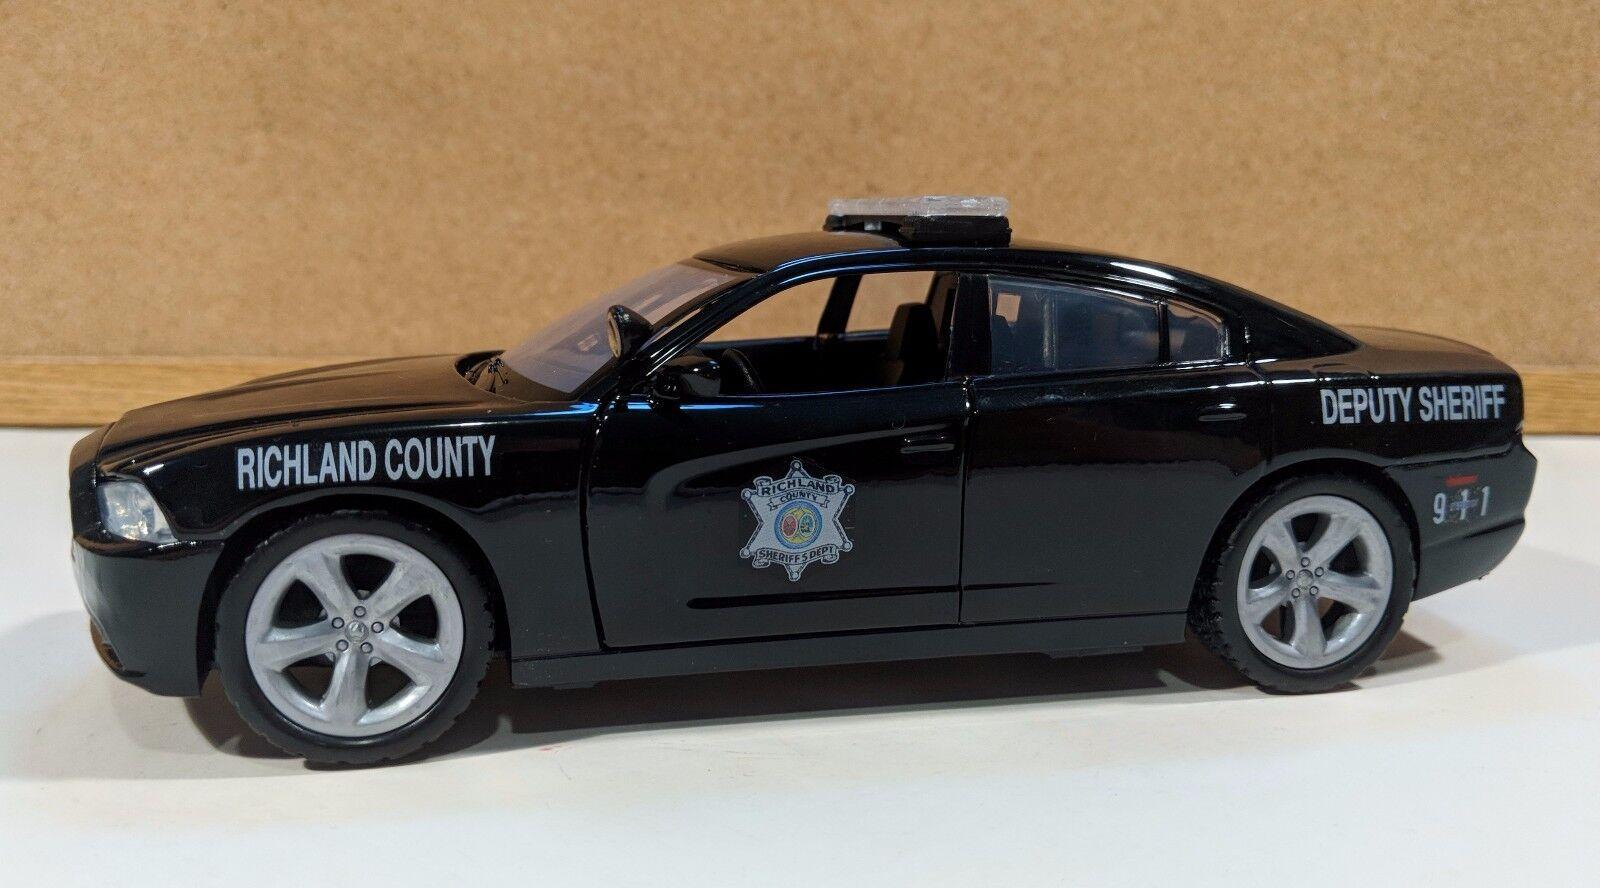 Condado de Richland SC Sheriff Personalizado 1 24 Escala Motormax Dodge Cochegador